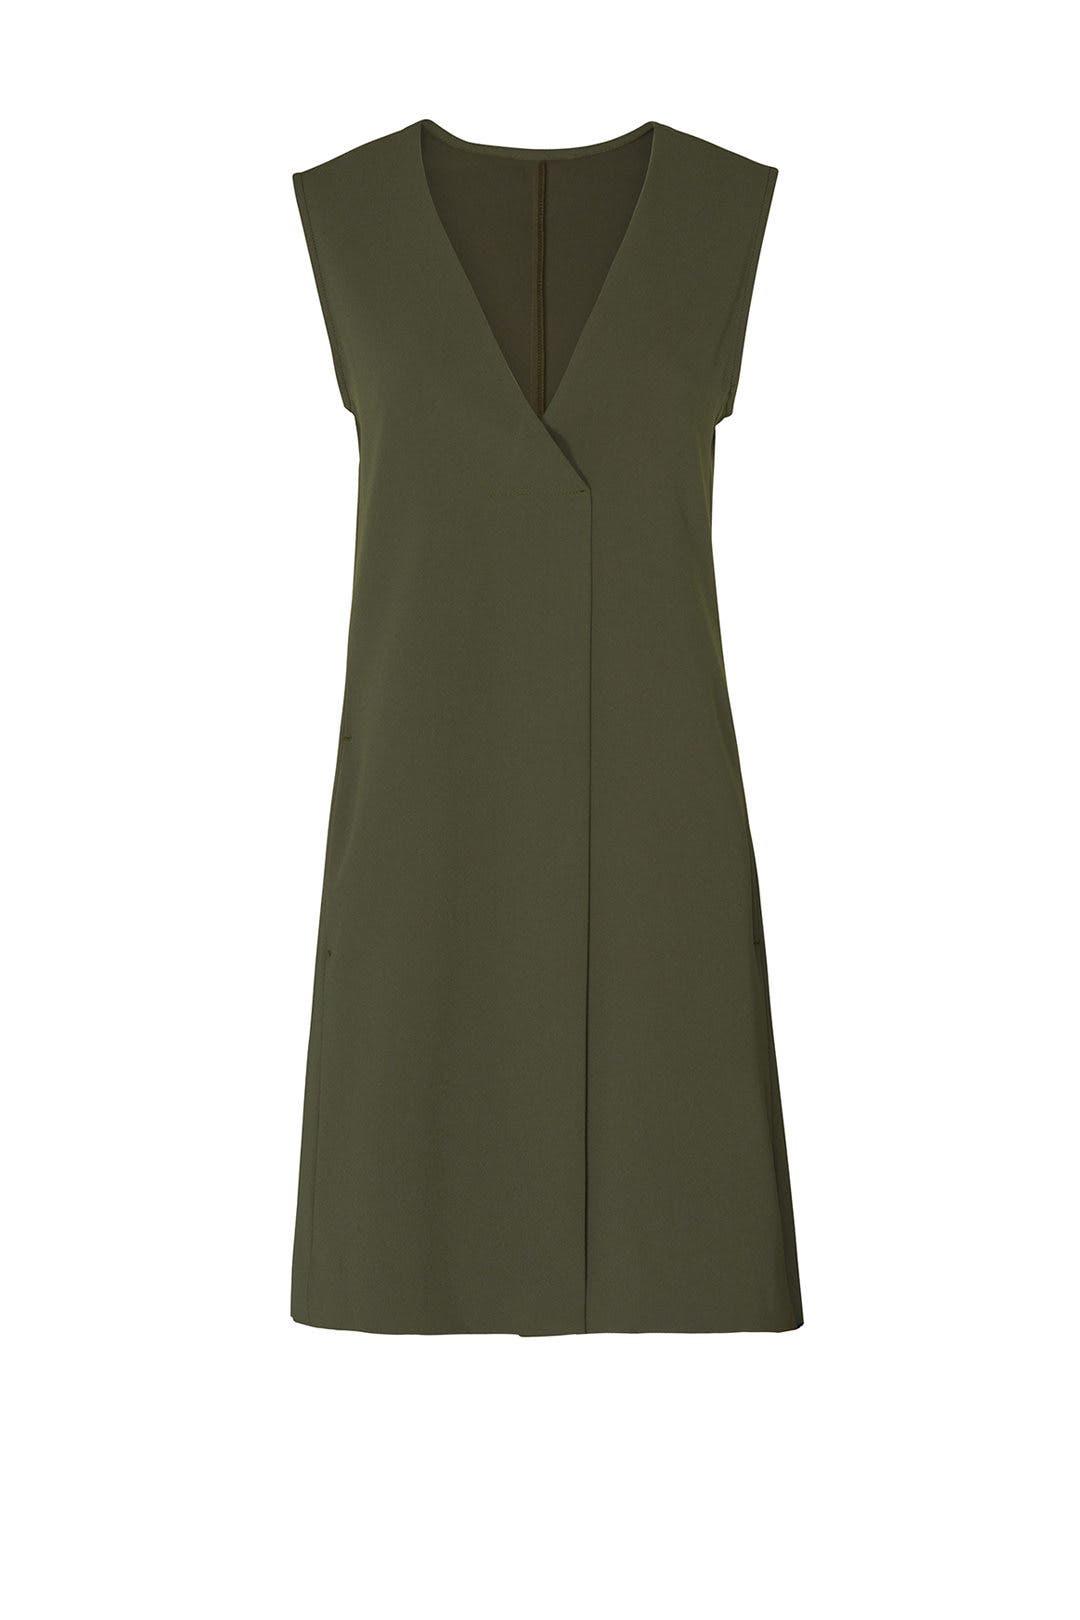 9ce54a41824 Fifteen Twenty. Read Reviews. Olive Pleat Front Dress